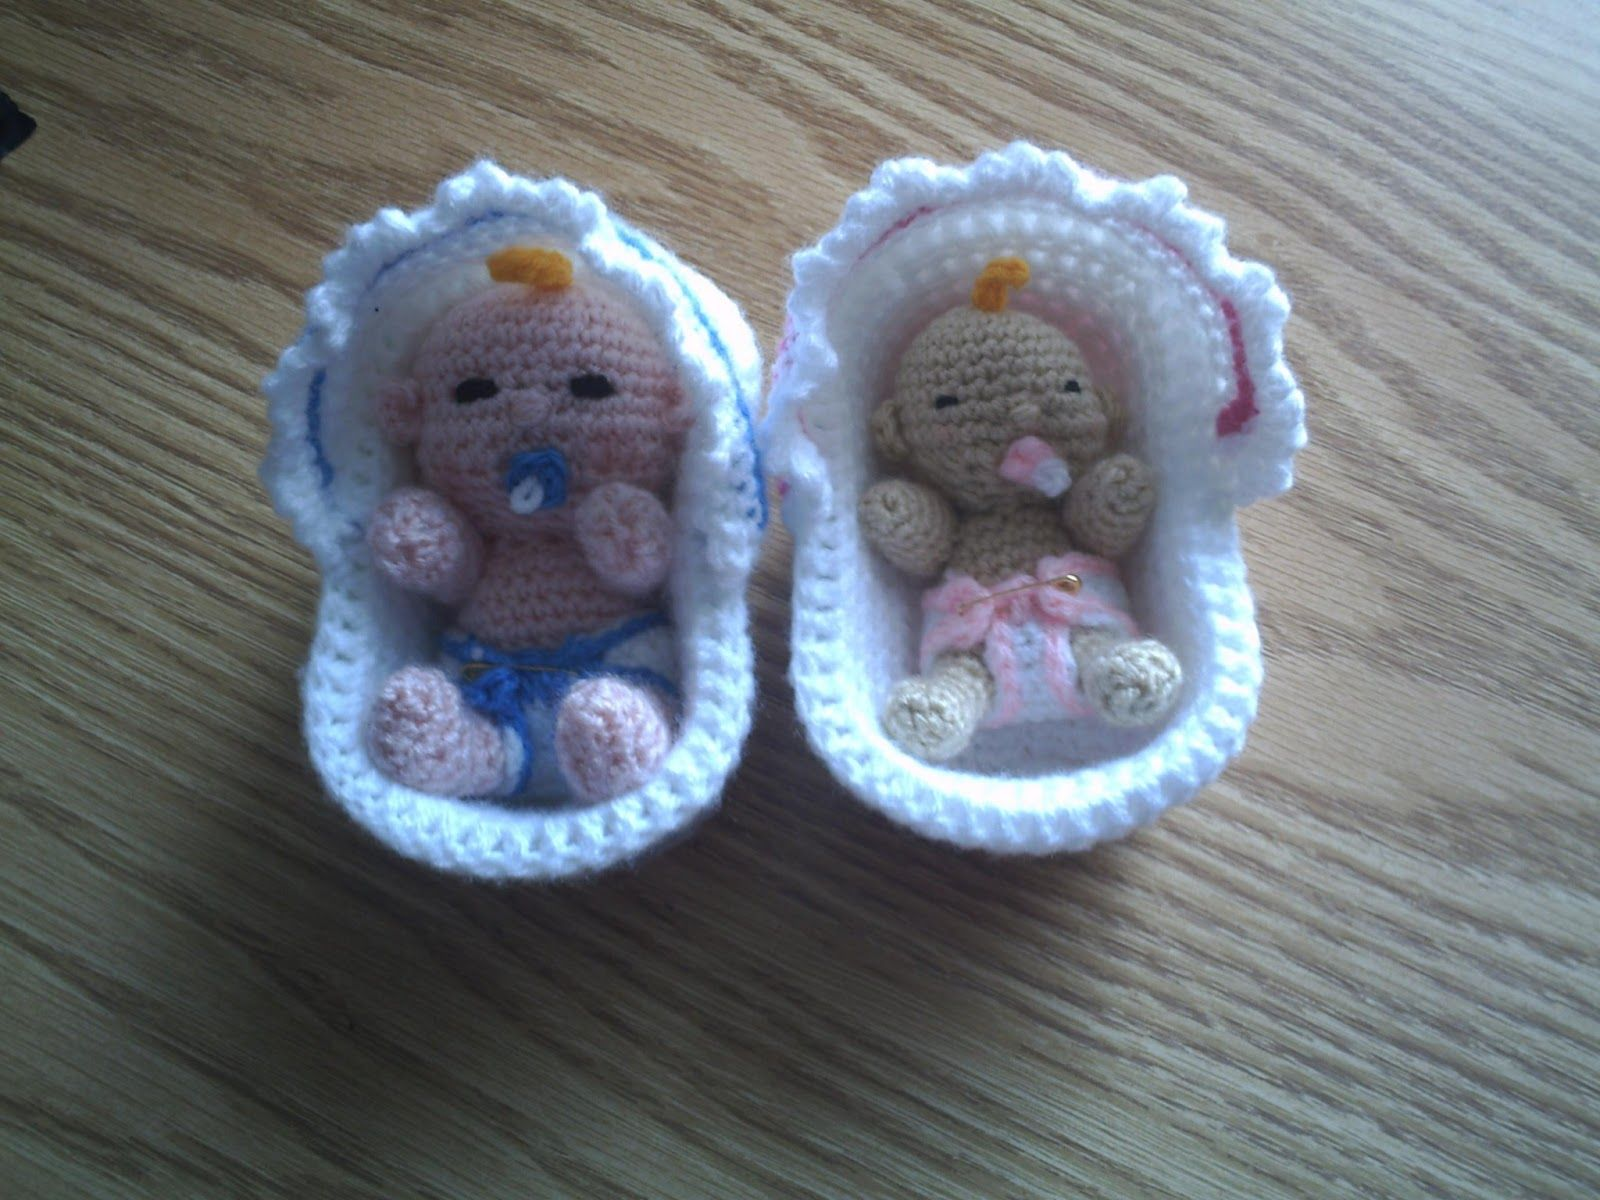 Amigurumi Dolls Free Patterns : Crochet dolls patterns amigurumi easy video tutorial